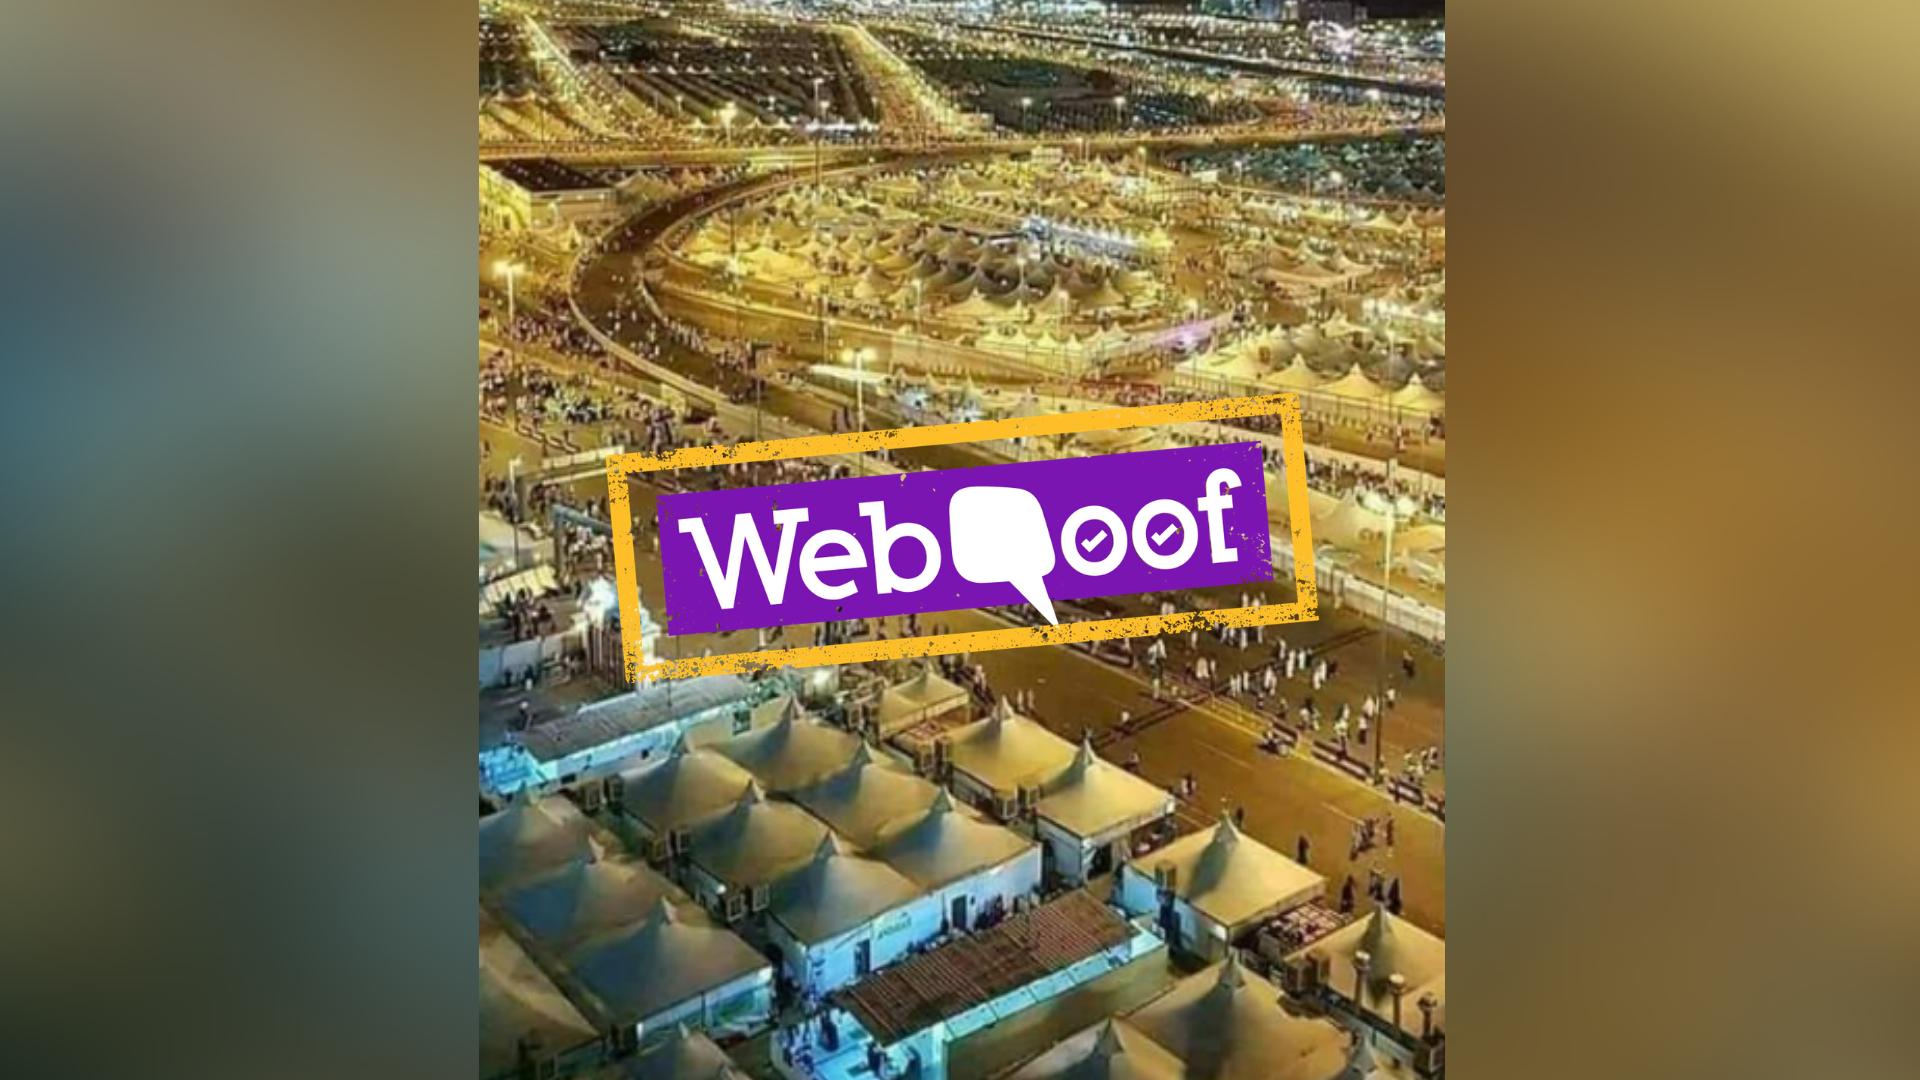 This is Kumbh Mela, Not Saudi, Claims Viral Post. But Saudi It is!